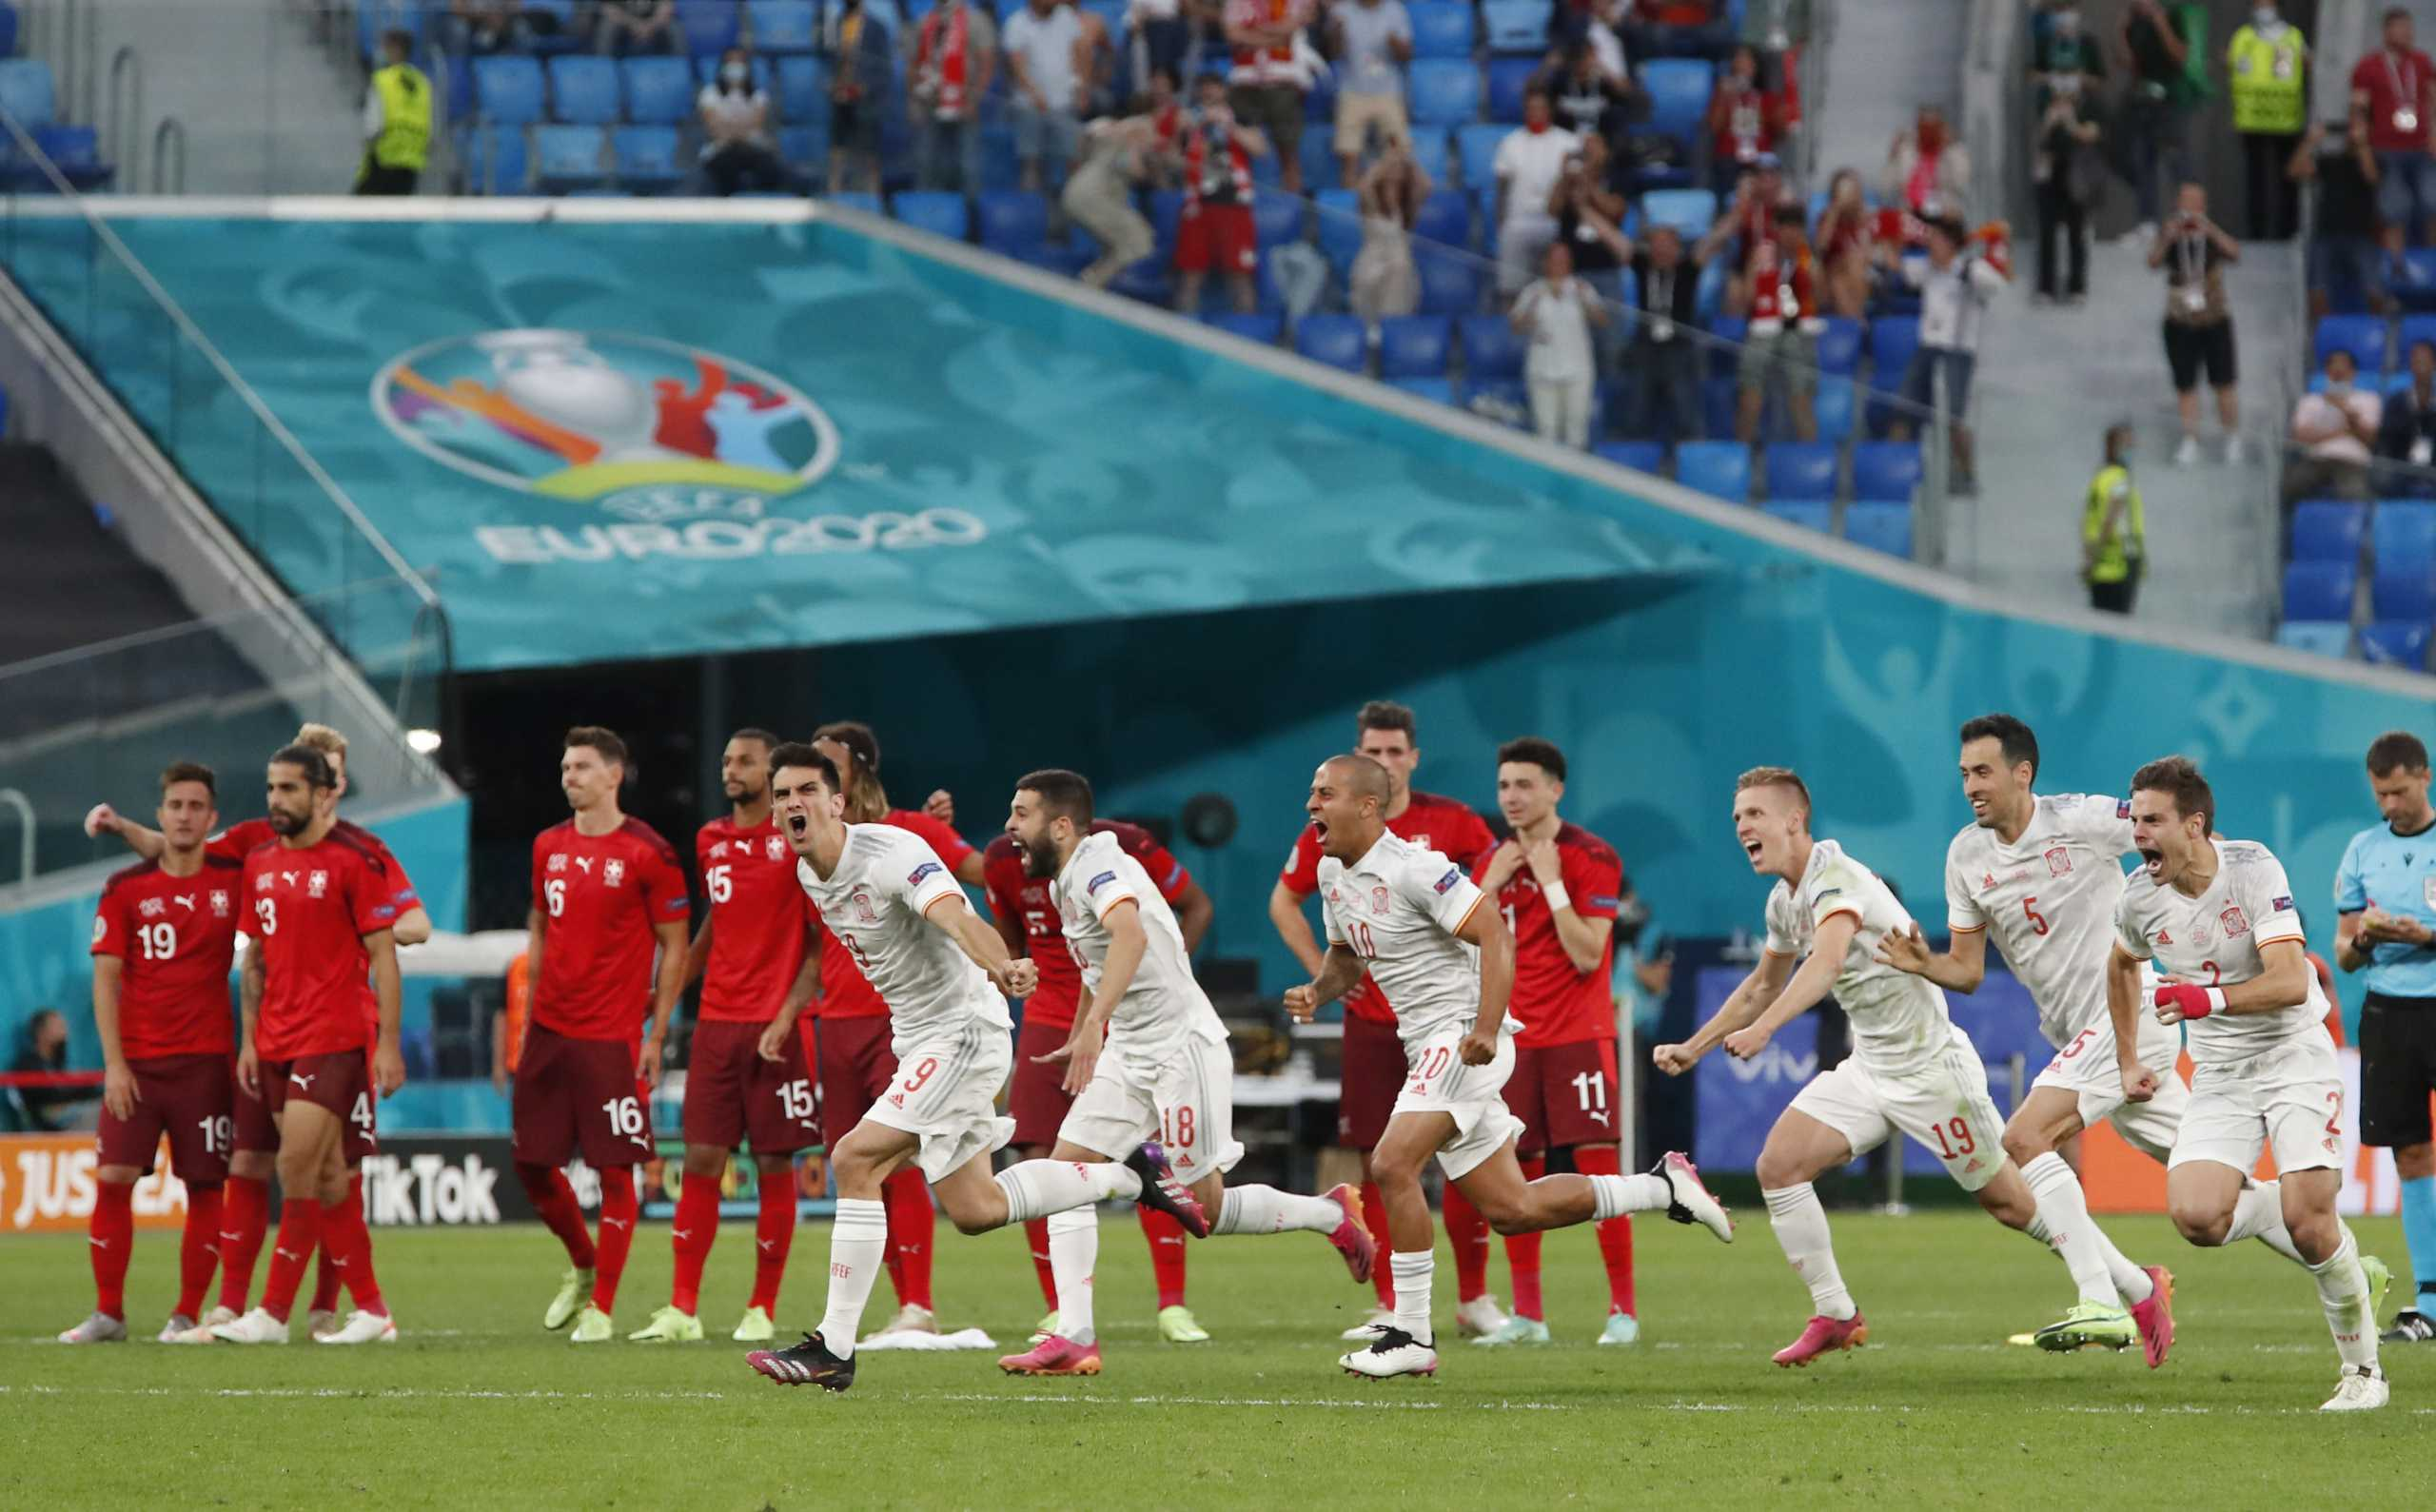 Euro 2020, Ελβετία – Ισπανία 1-3 στα πέναλτι: Στα ημιτελικά με ήρωα Σιμόν οι Ίβηρες